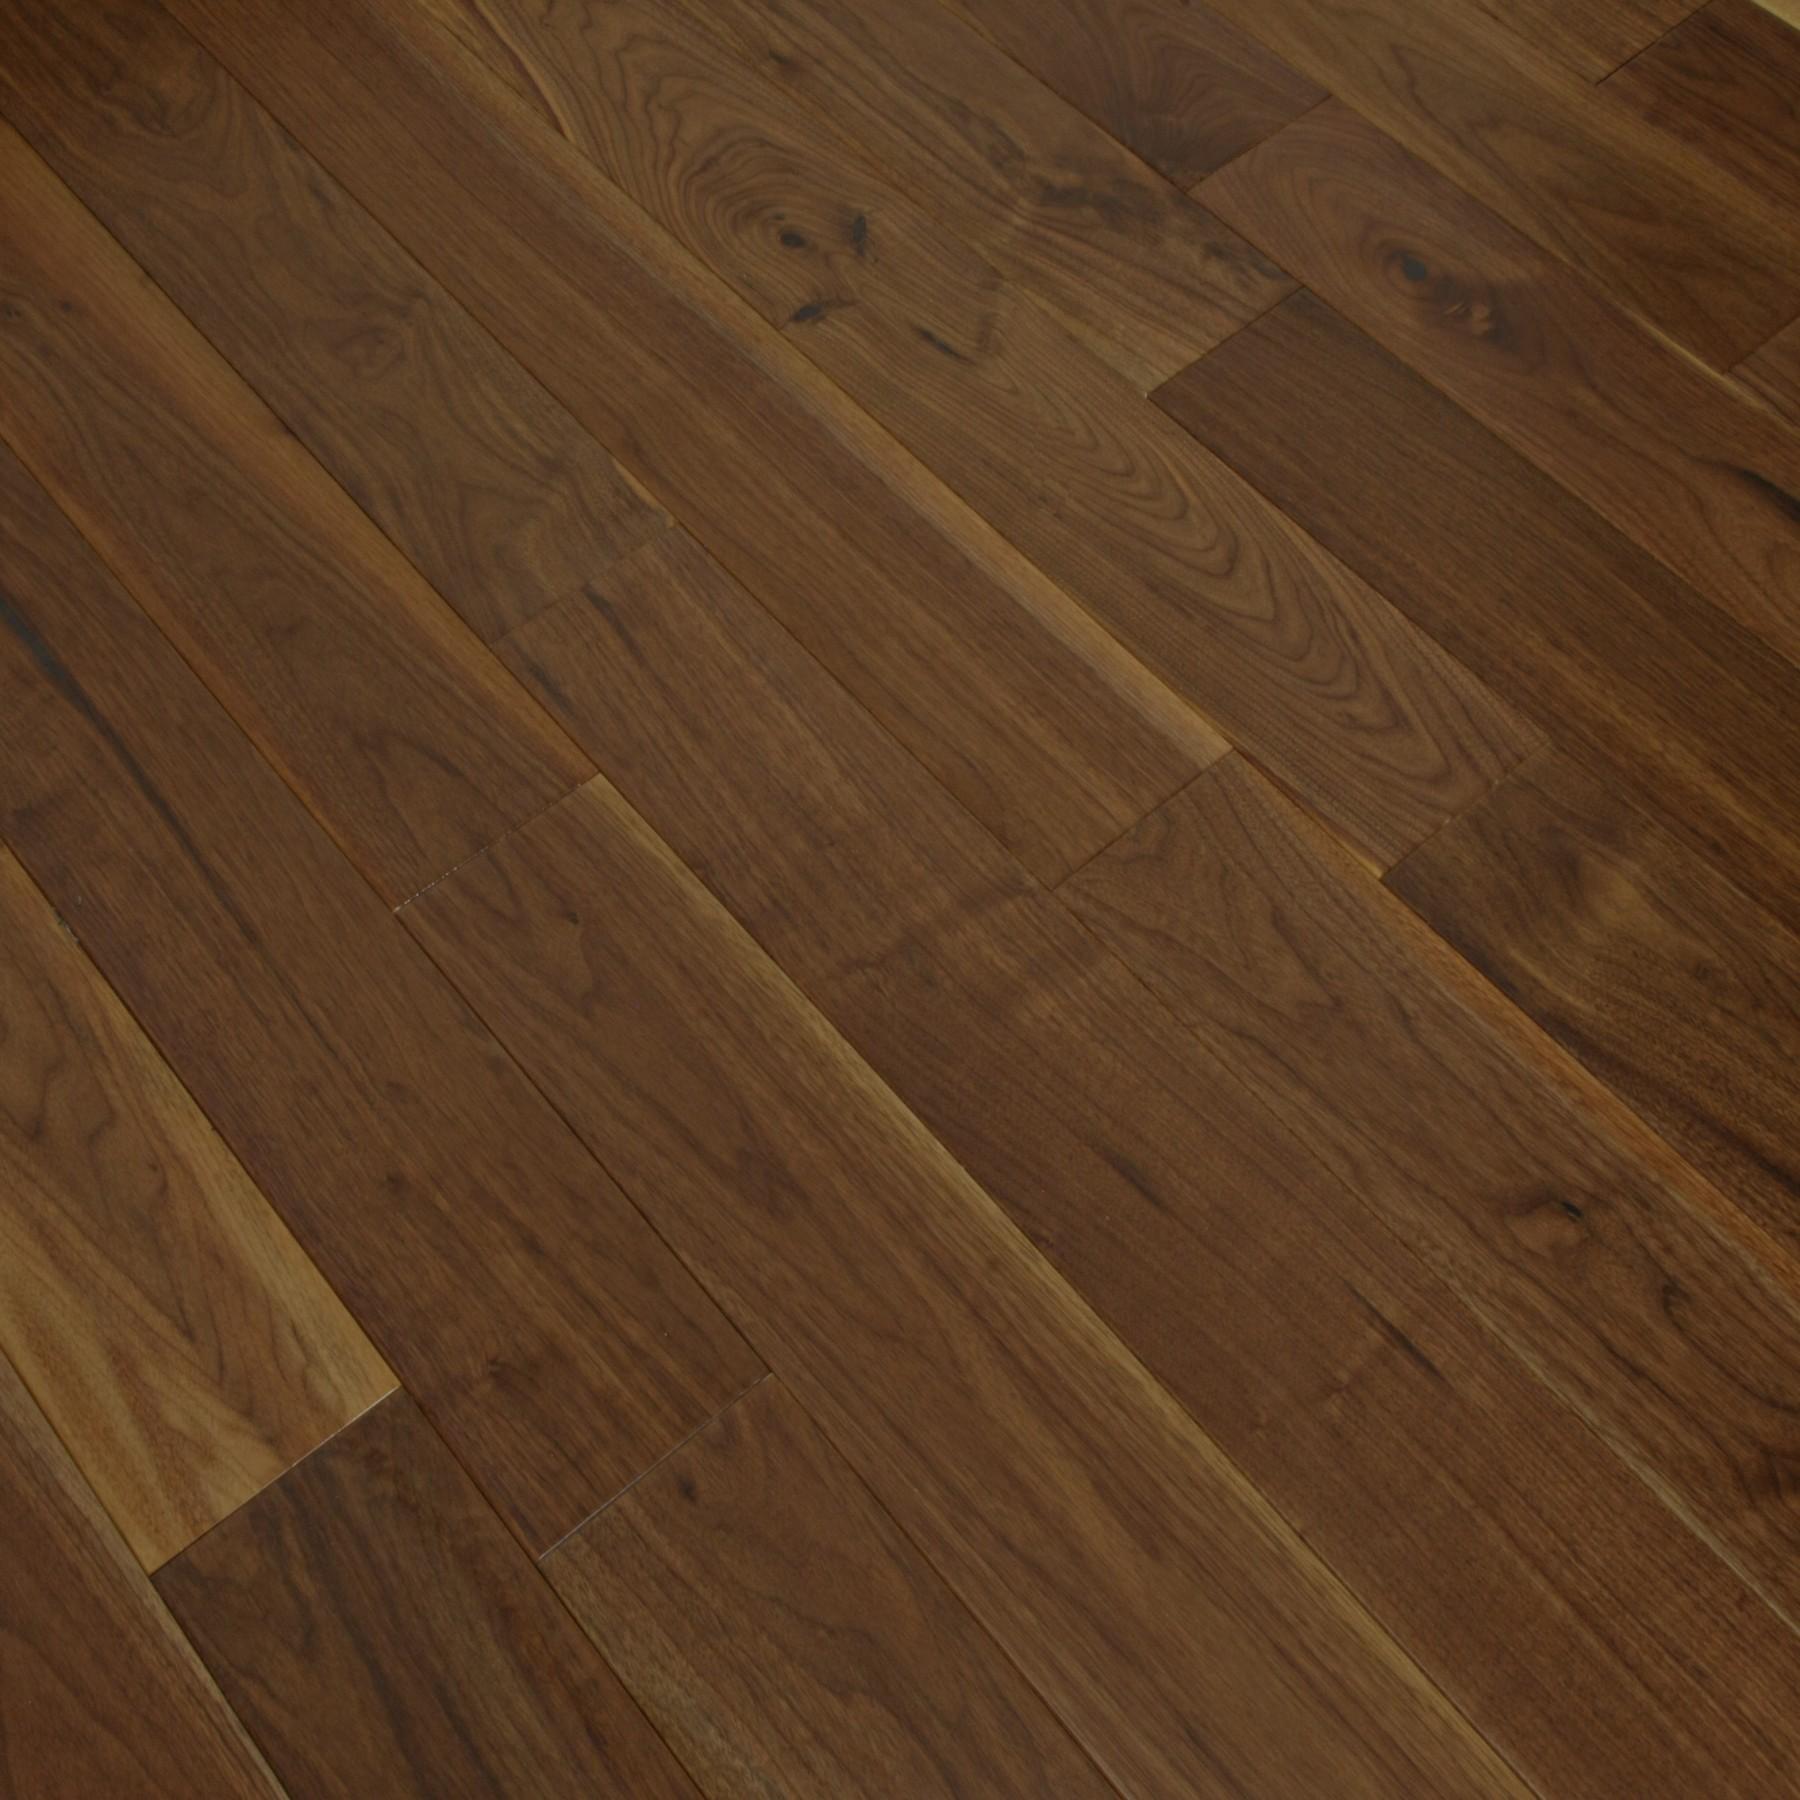 BELLA AURORA Walnut Flooring Lacquered